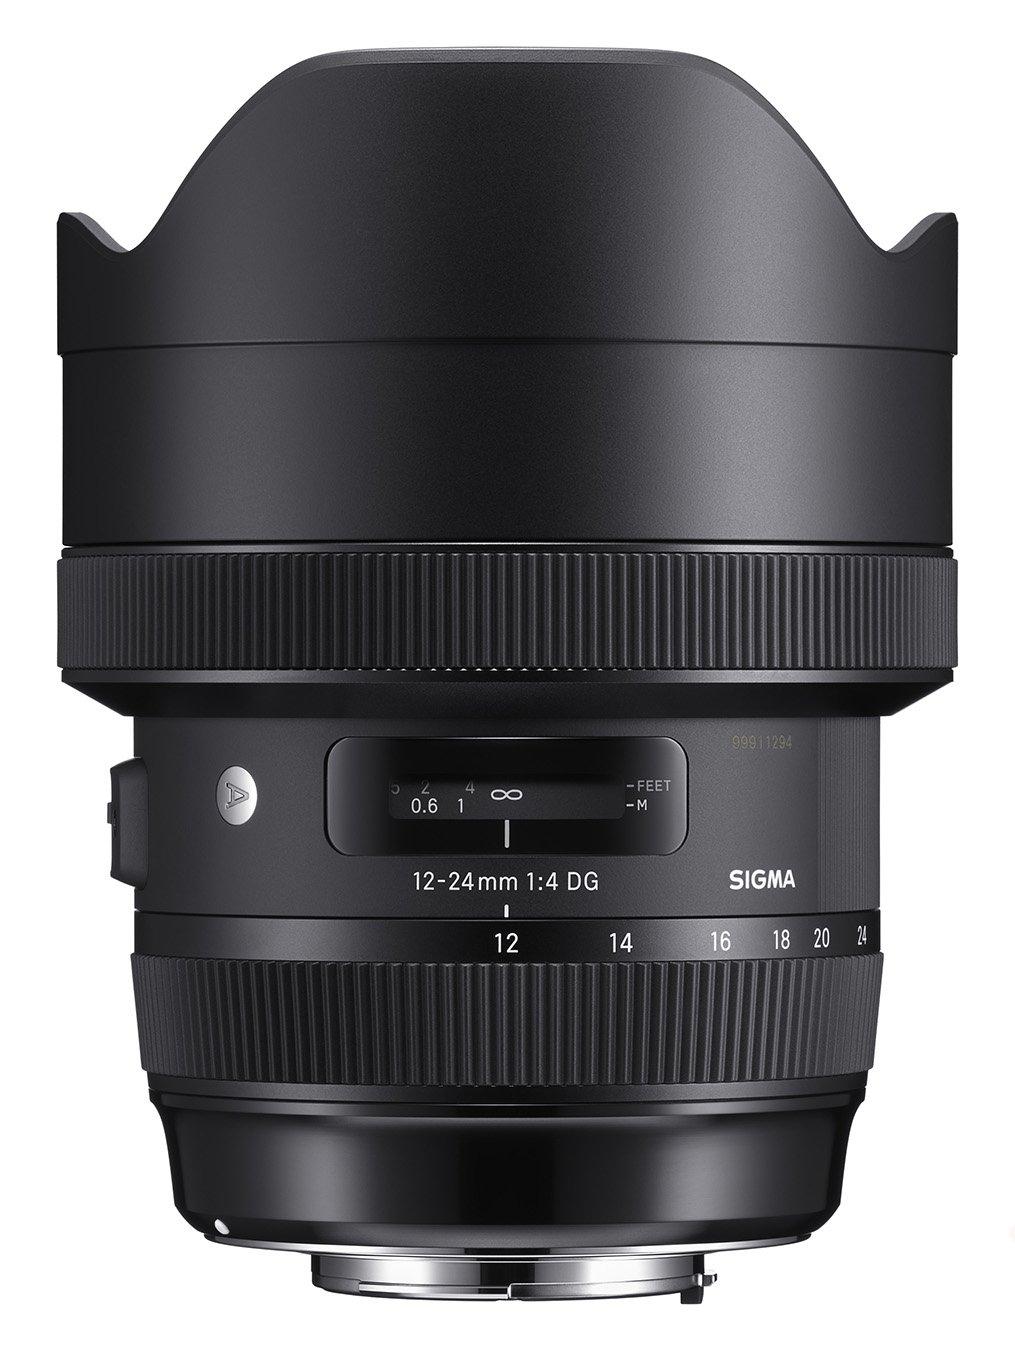 Sigma 14-24mm F/2.8 DG HSM Best Lenses For Camera In India